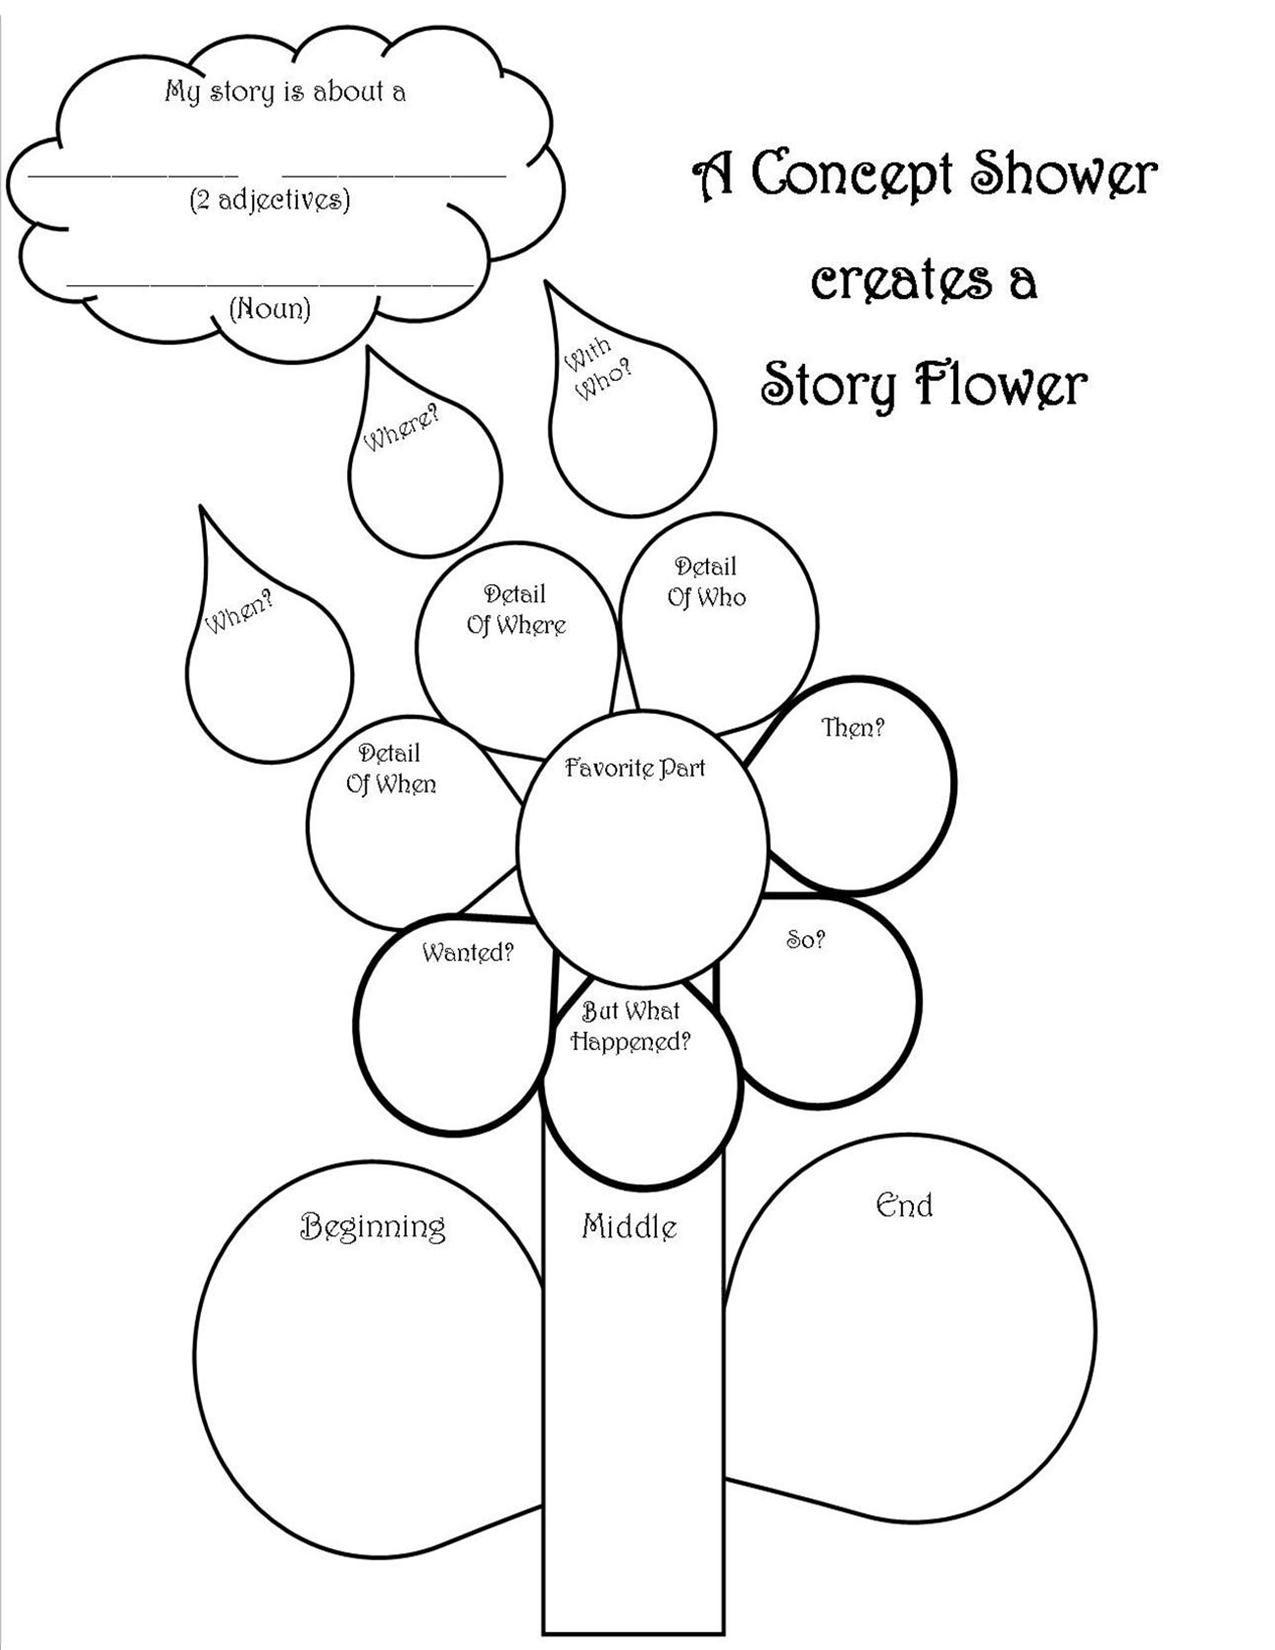 ~A Concept Shower Creates A Story Flower designed by Tasha